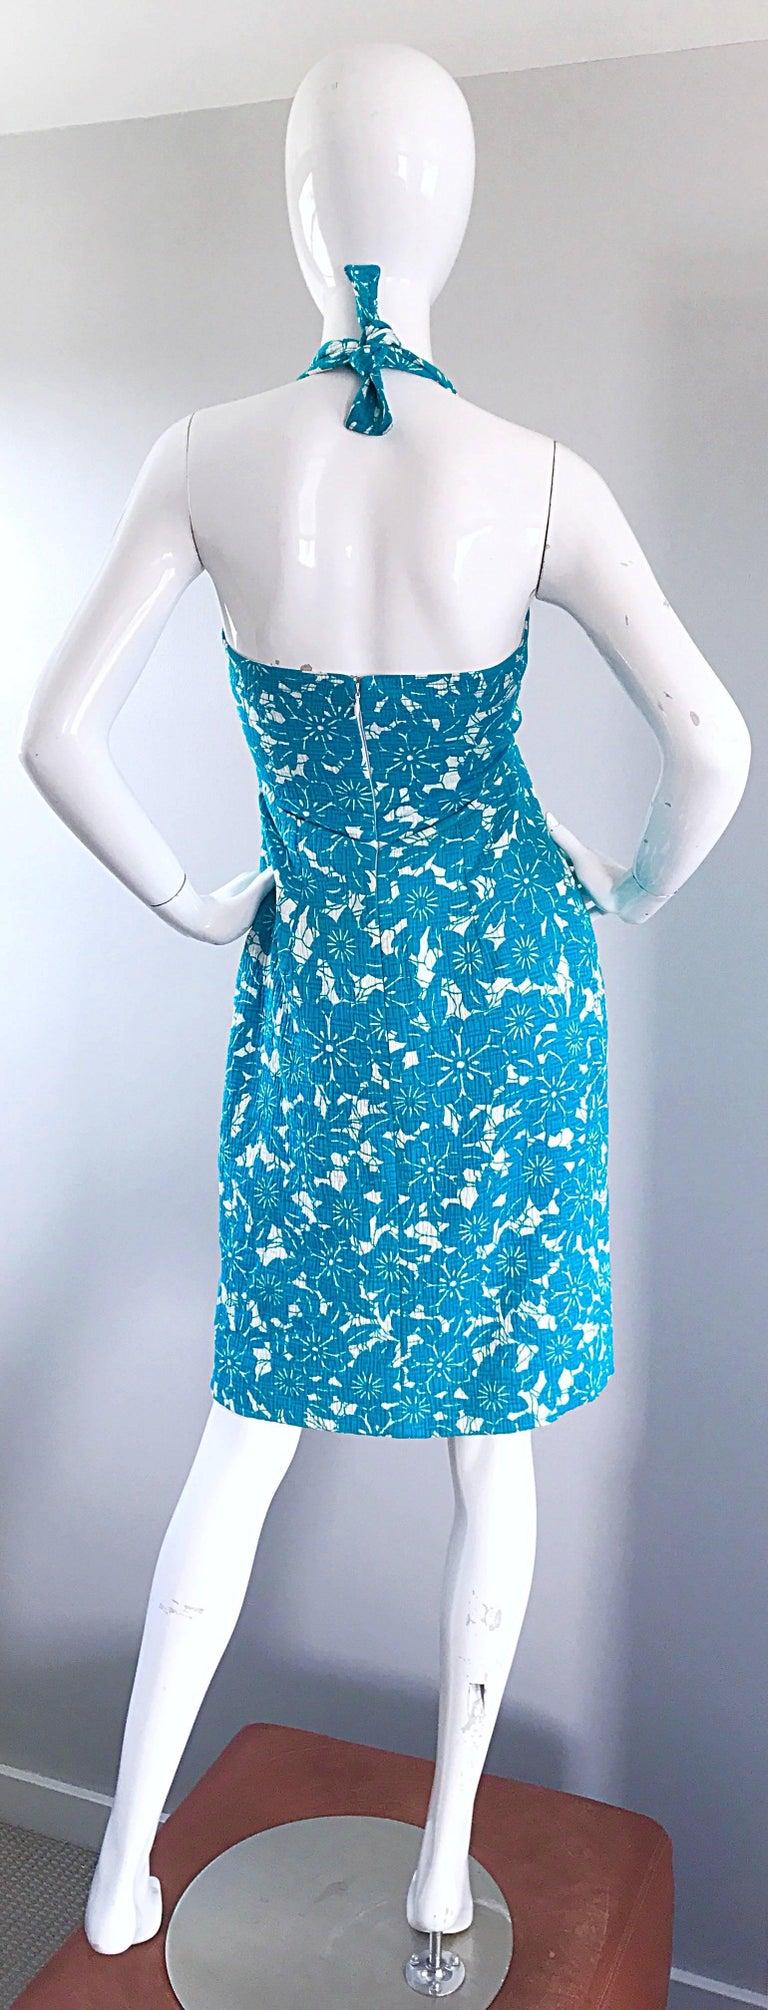 afd3fa2b9f3c Women's Vintage Oscar de la Renta 1990s Turquoise Blue + White Hawaiian 90s  Halter Dress For